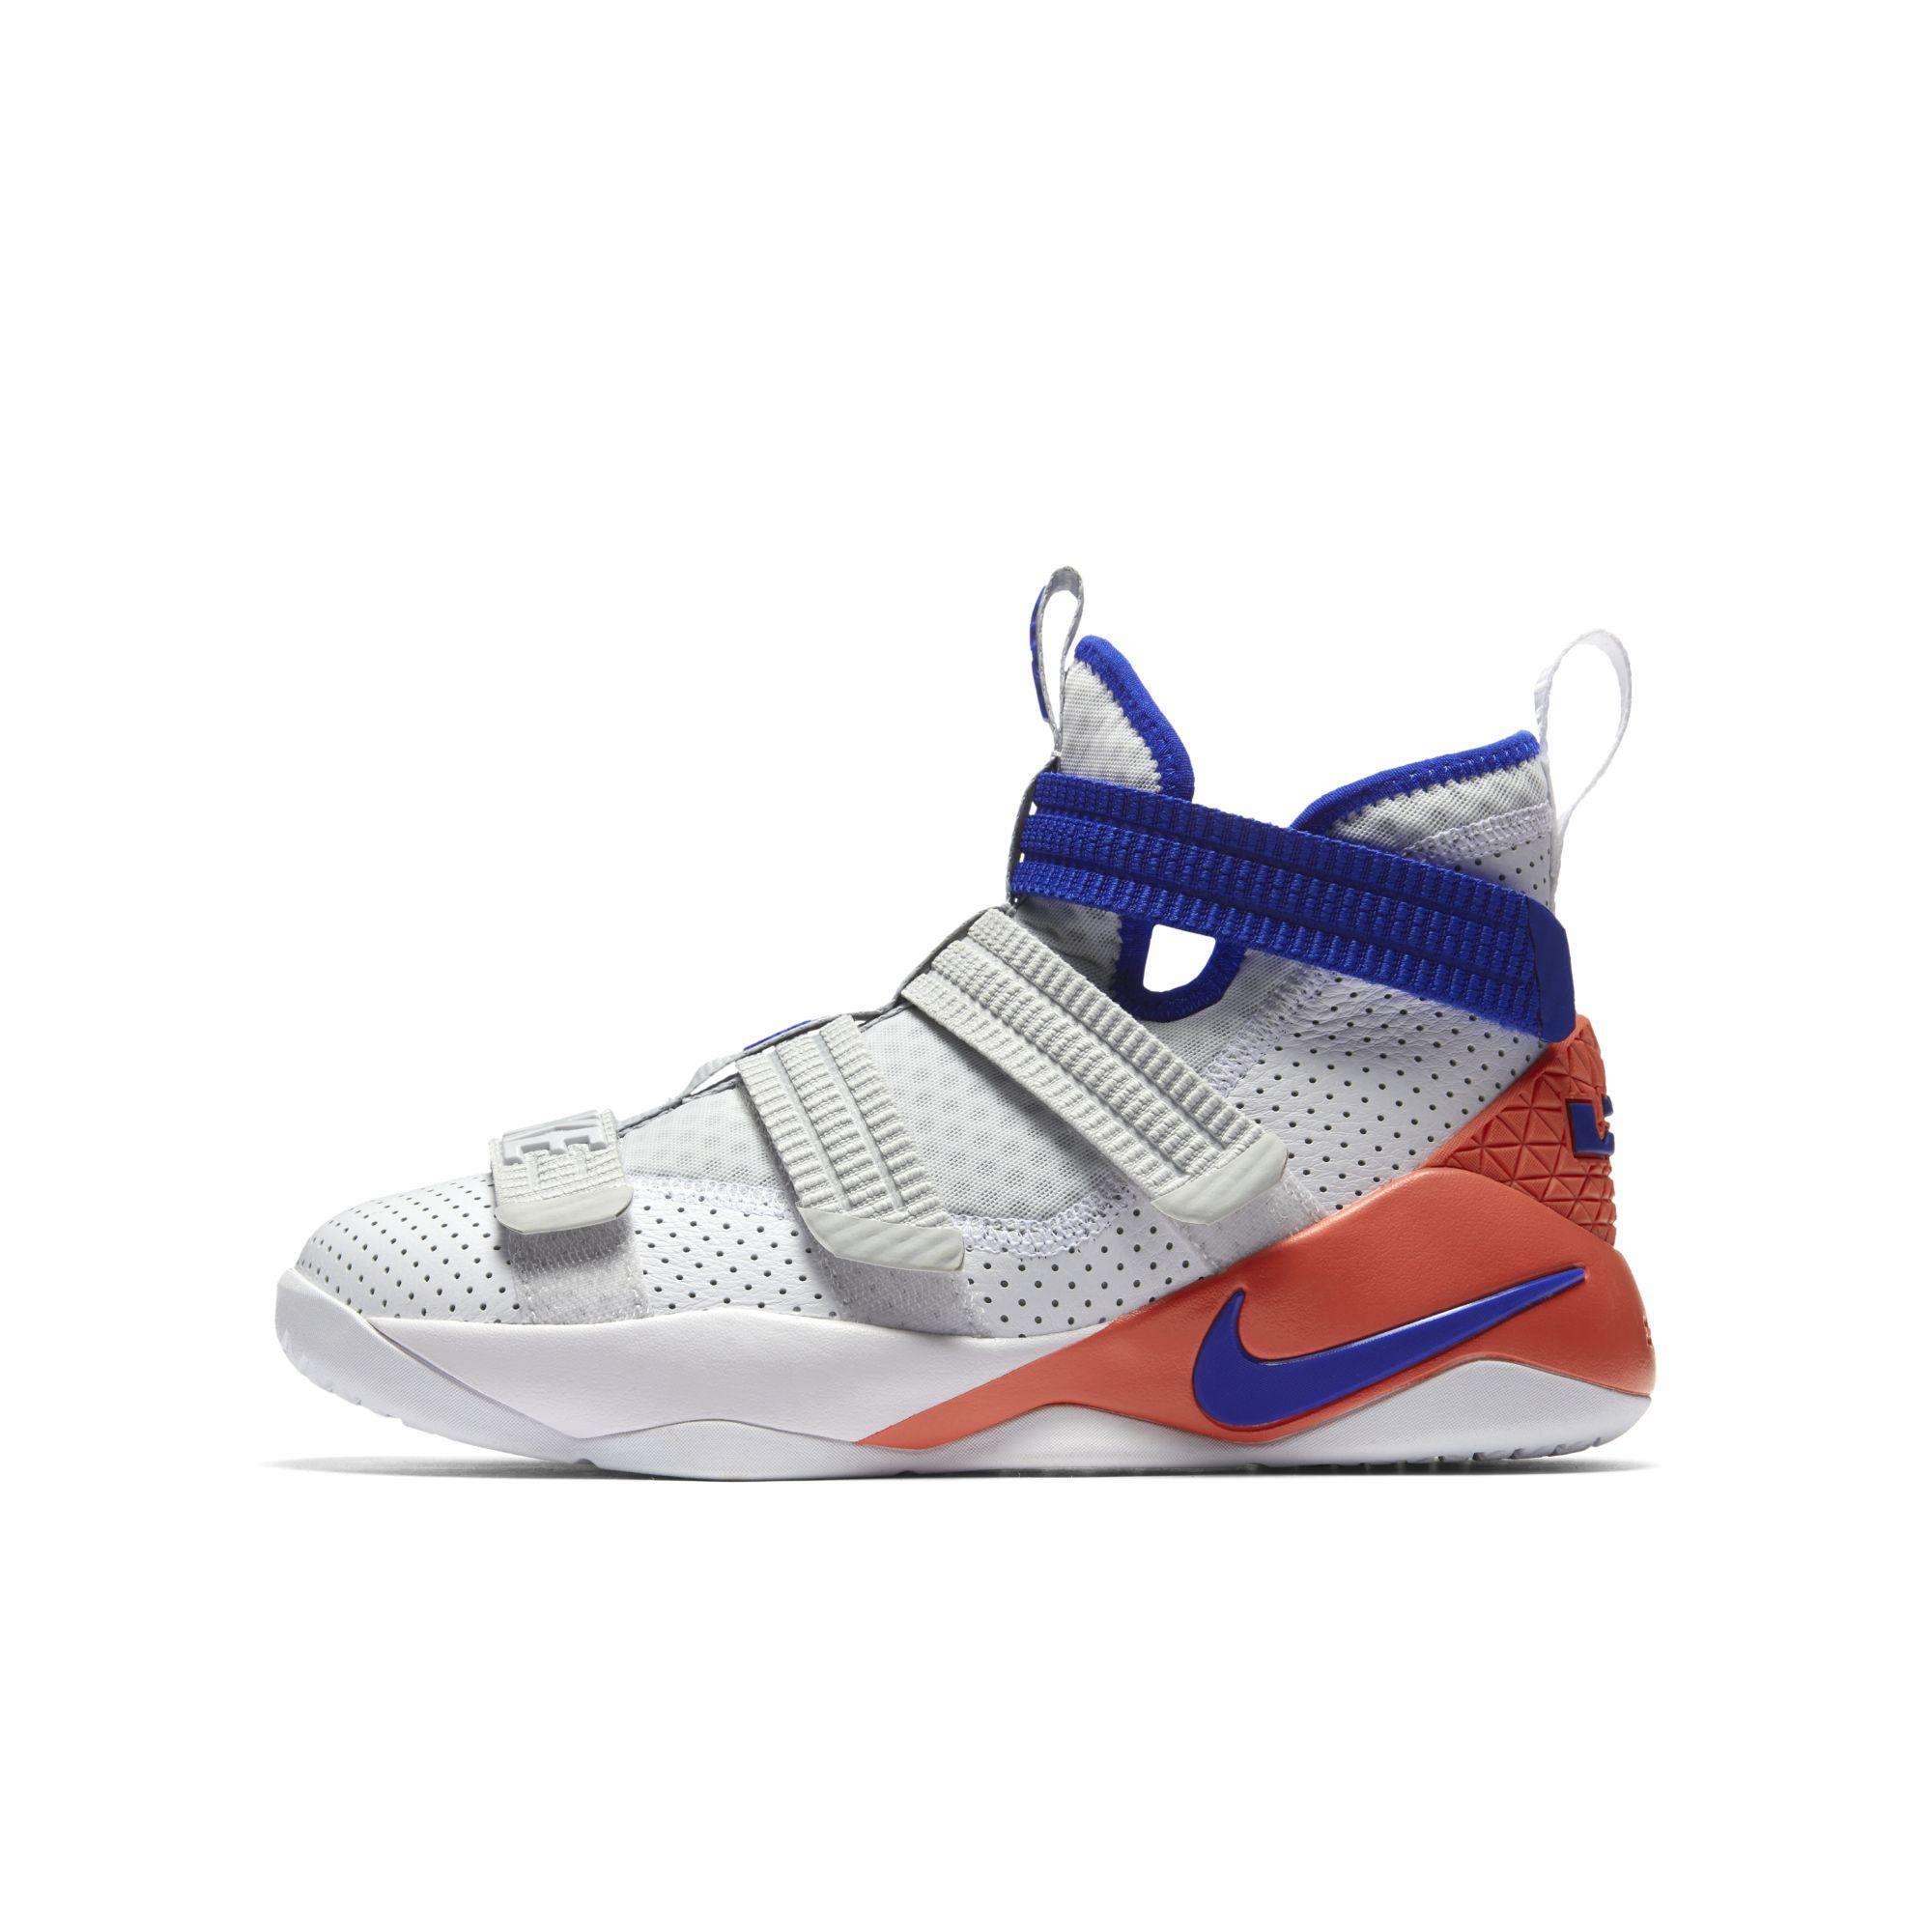 6fad577e1d5b Nike LeBron Soldier 11 GS